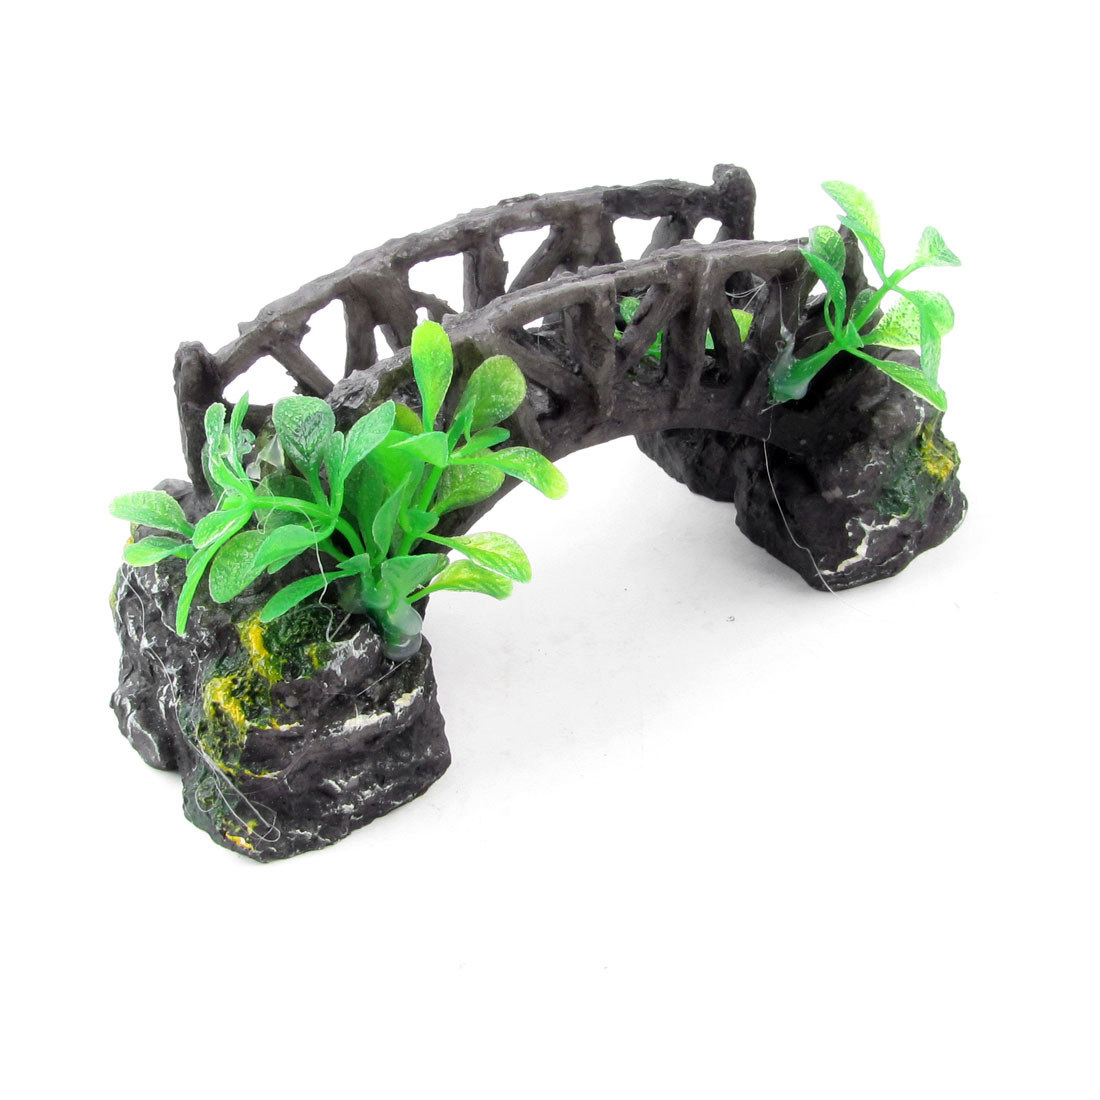 "Resin Arch Stone Bridge Ornament Decorative 6.3"" Long for Fish Tank"